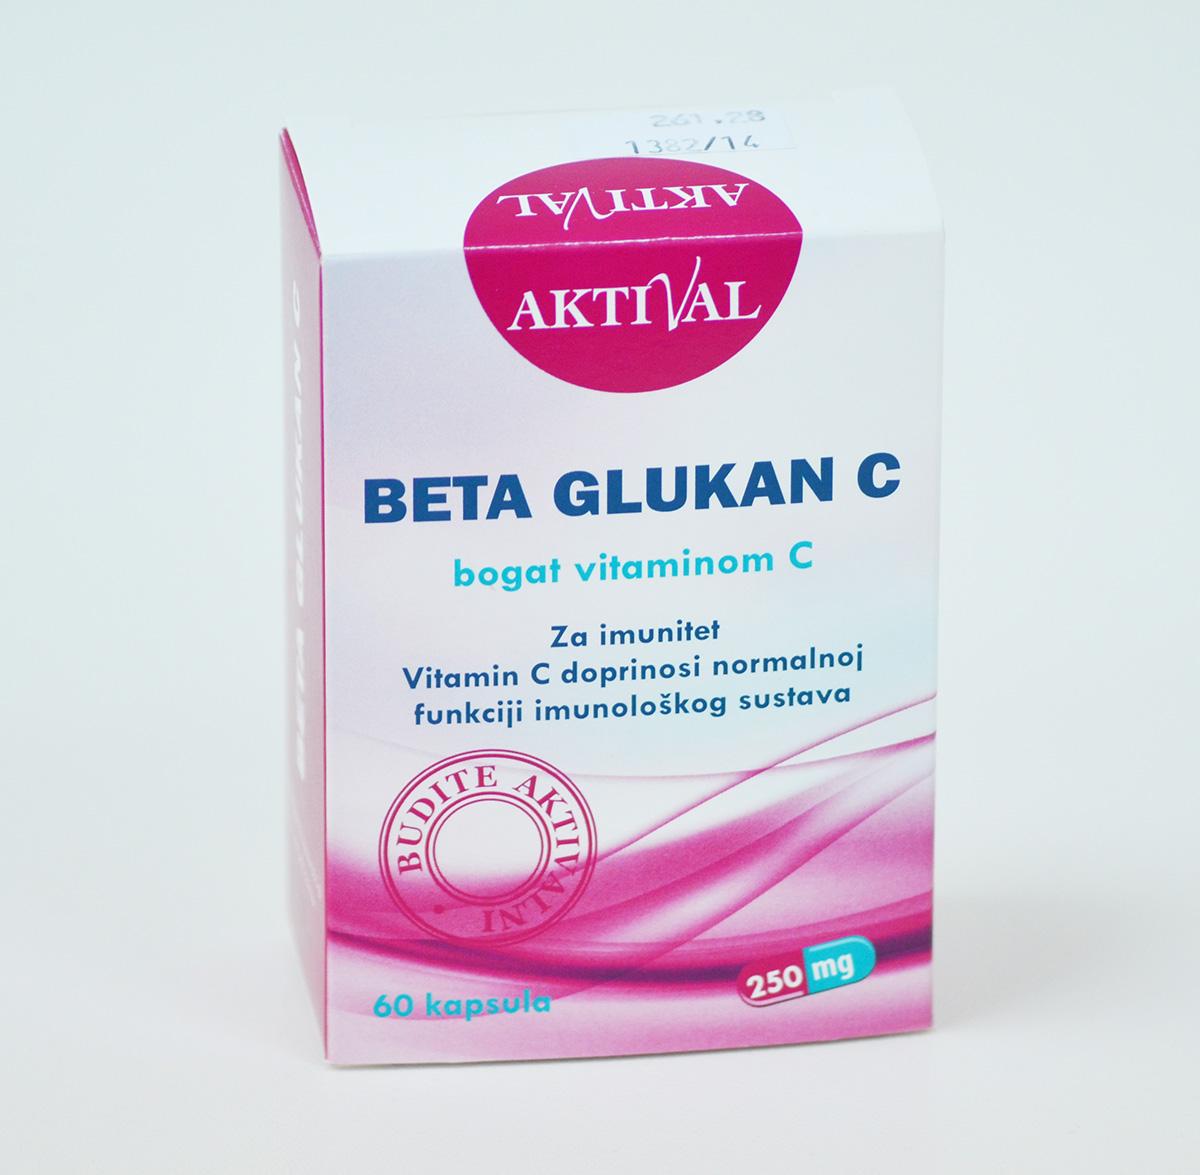 Diflucan kapsule 150 mg cijena / Clomid is used for on